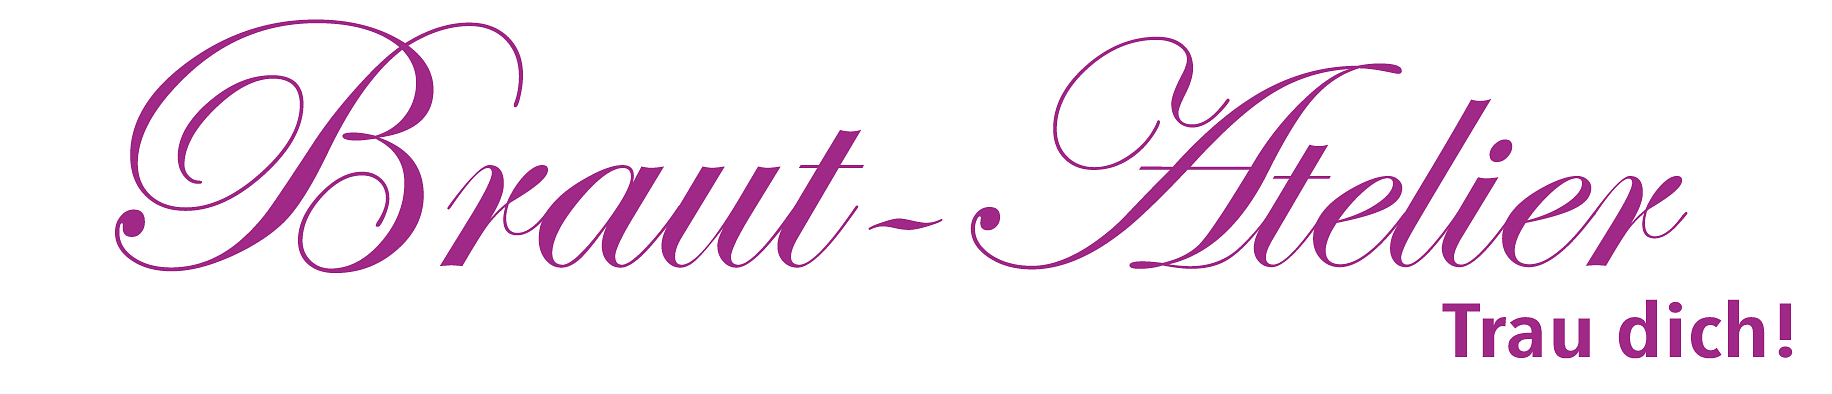 Braut-Atelier 09 GmbH